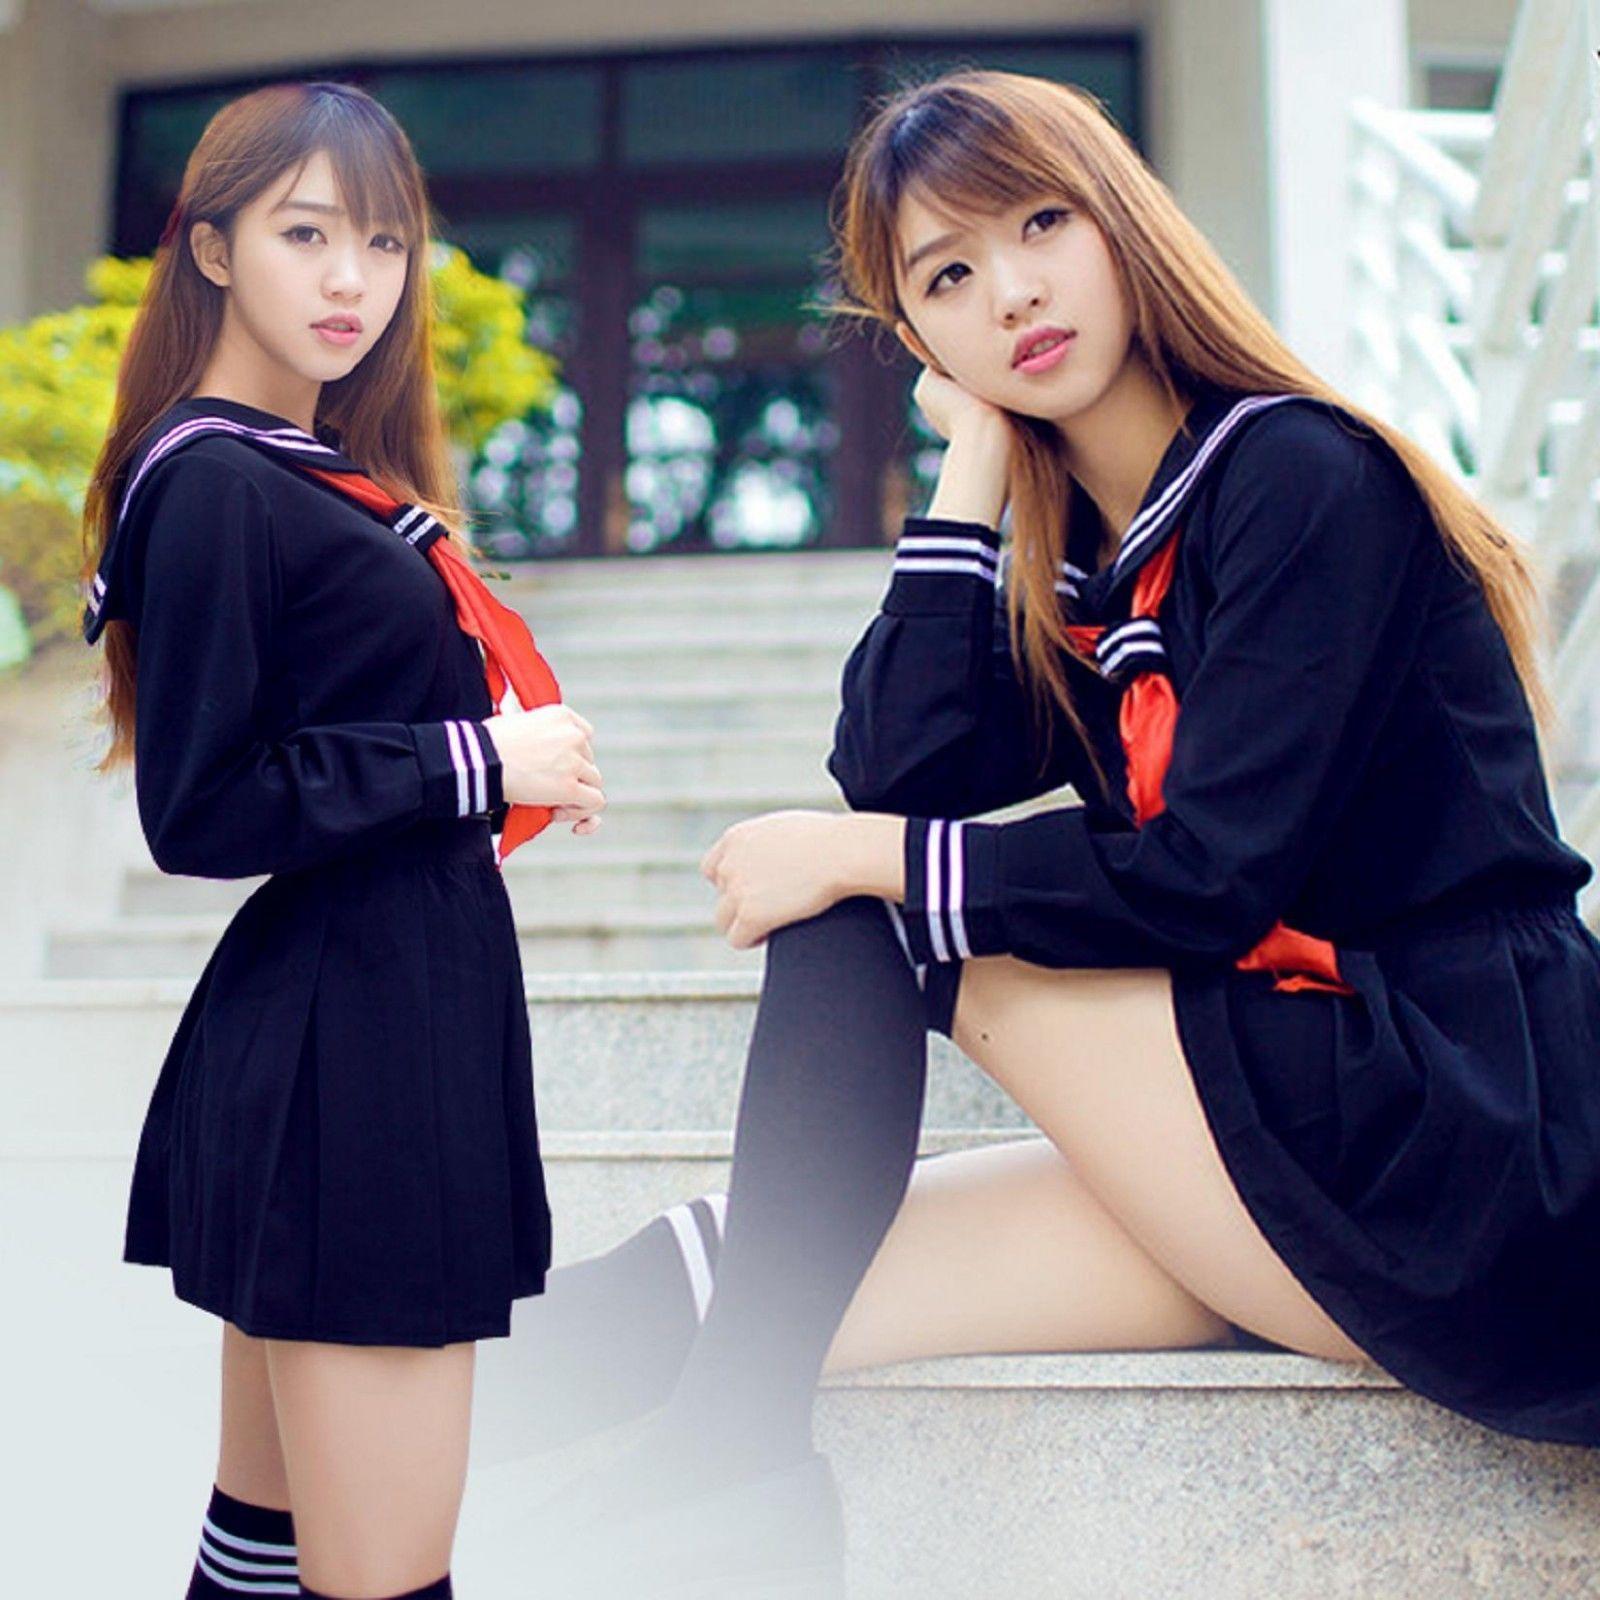 Uniform escort girls